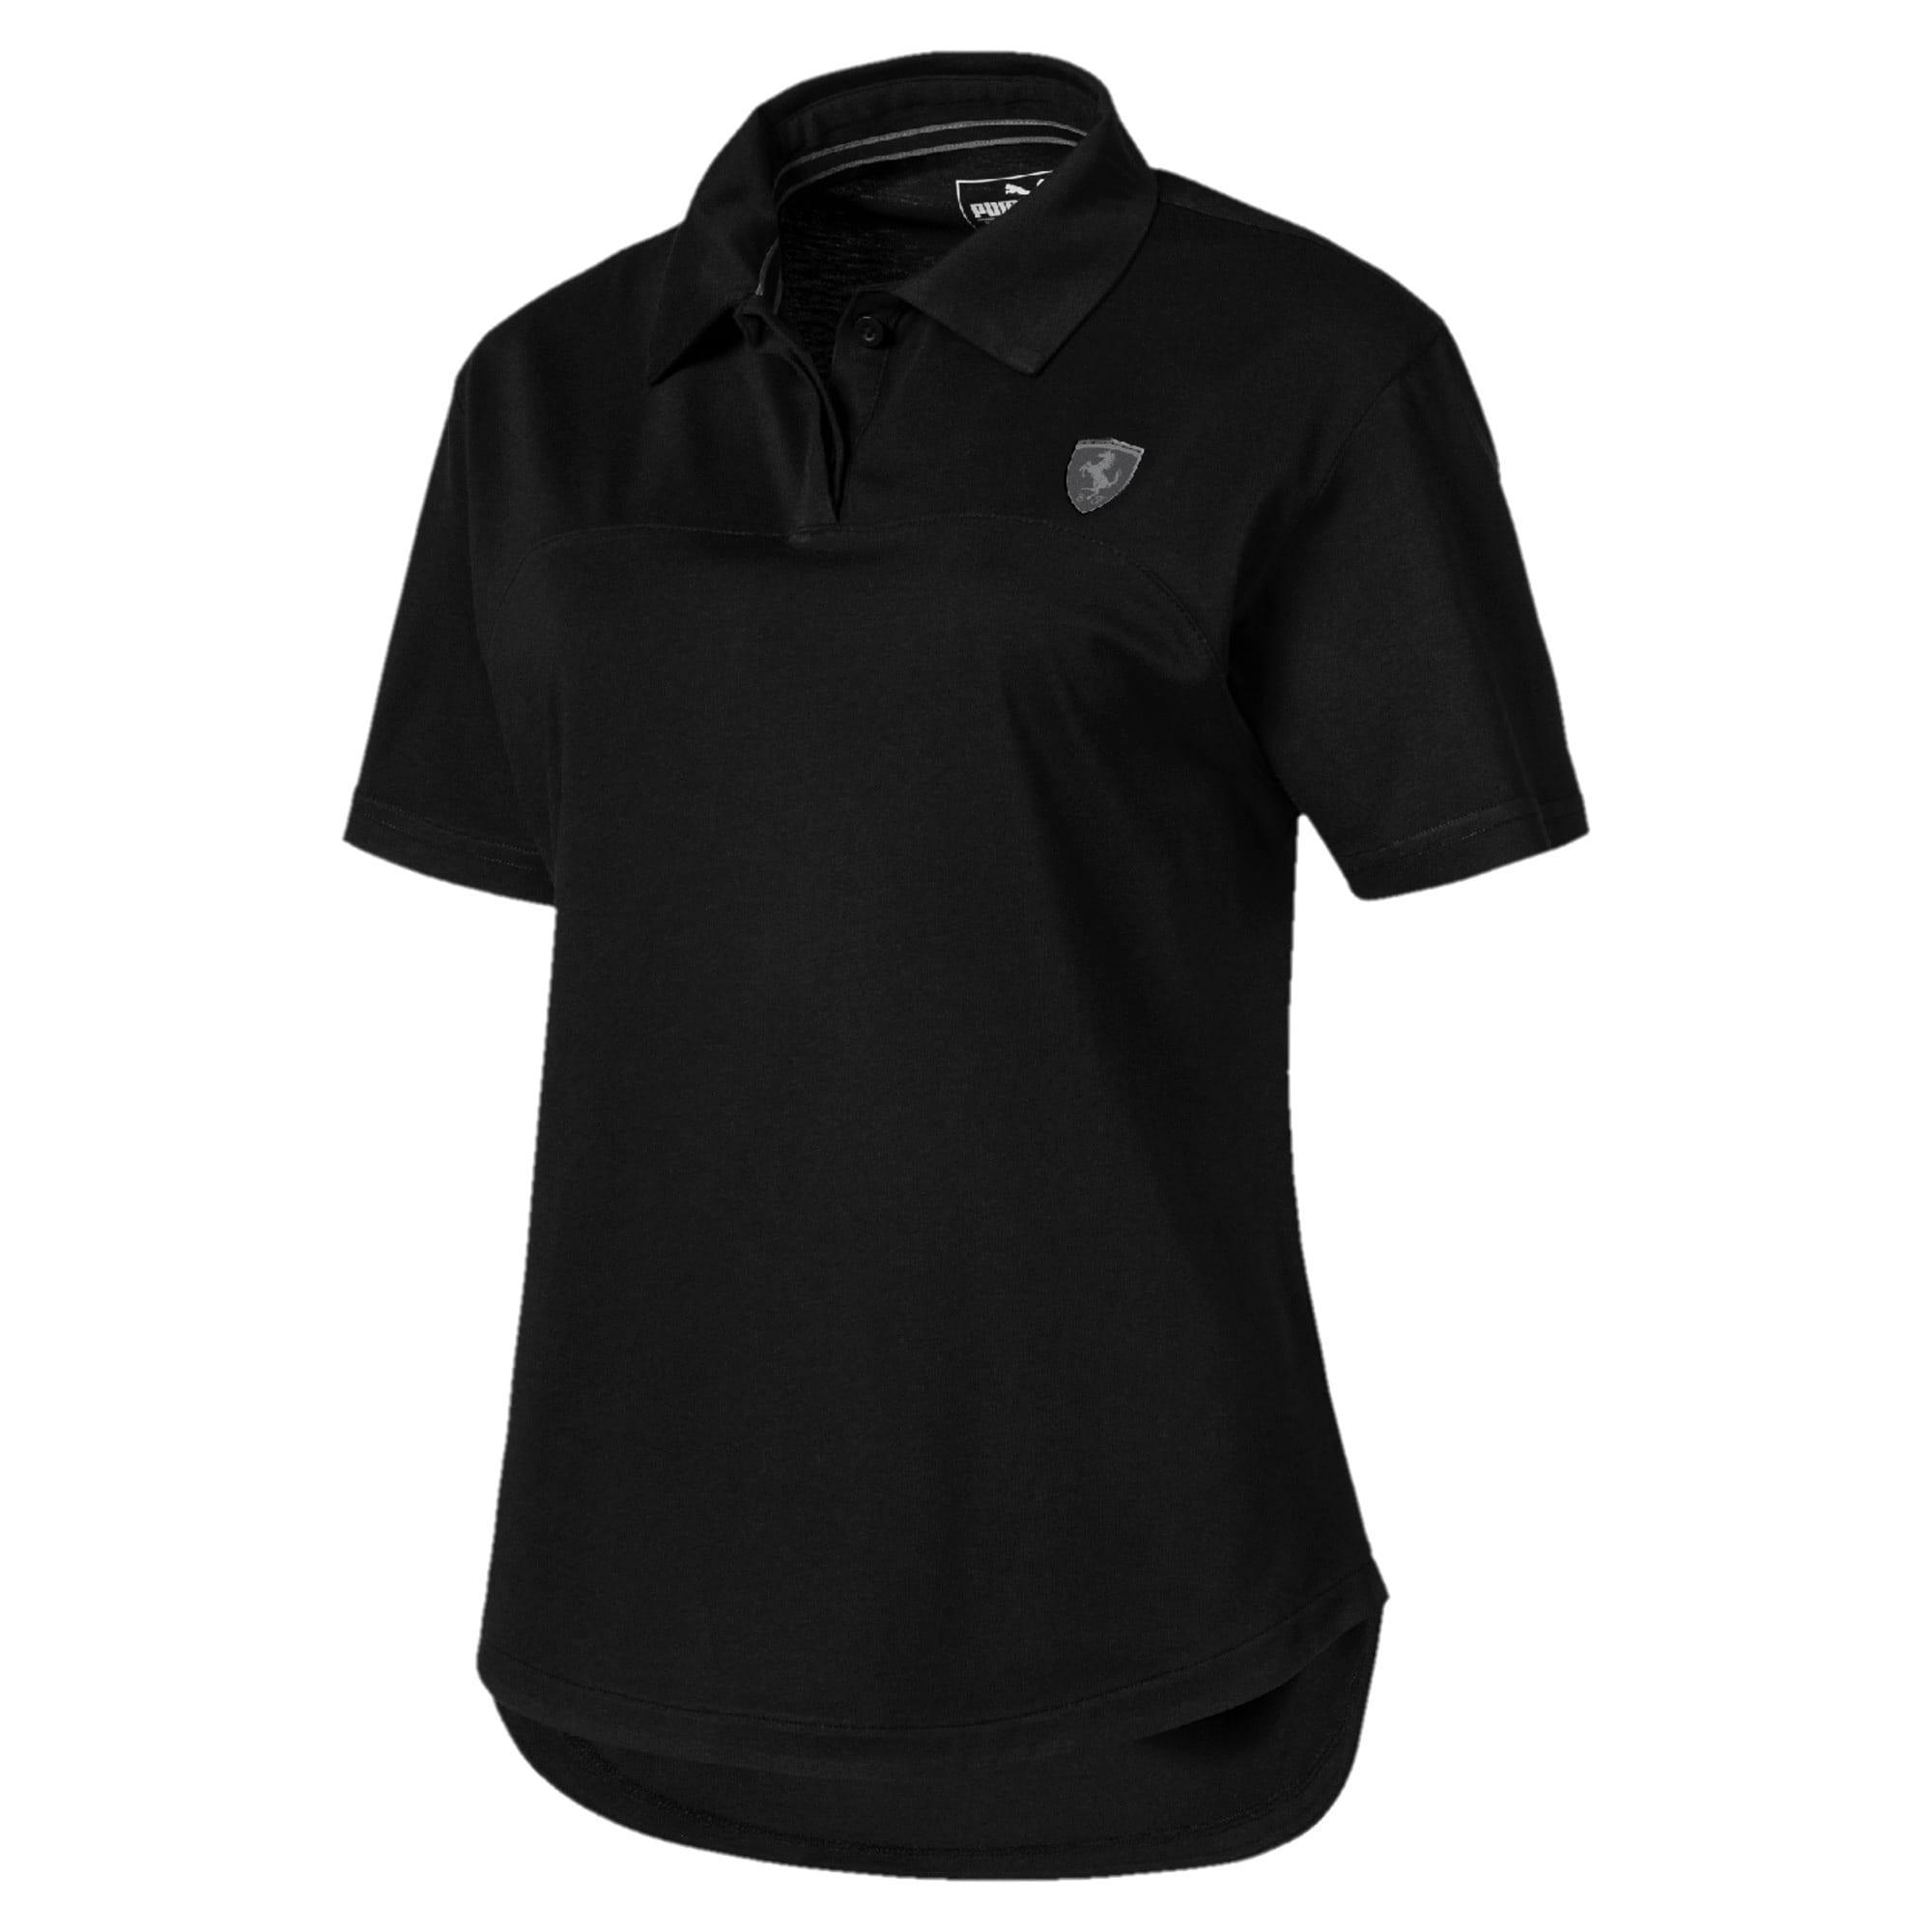 Miniatura 4 de Camiseta tipo polo Scuderia Ferrari para mujer, Puma Black, mediano